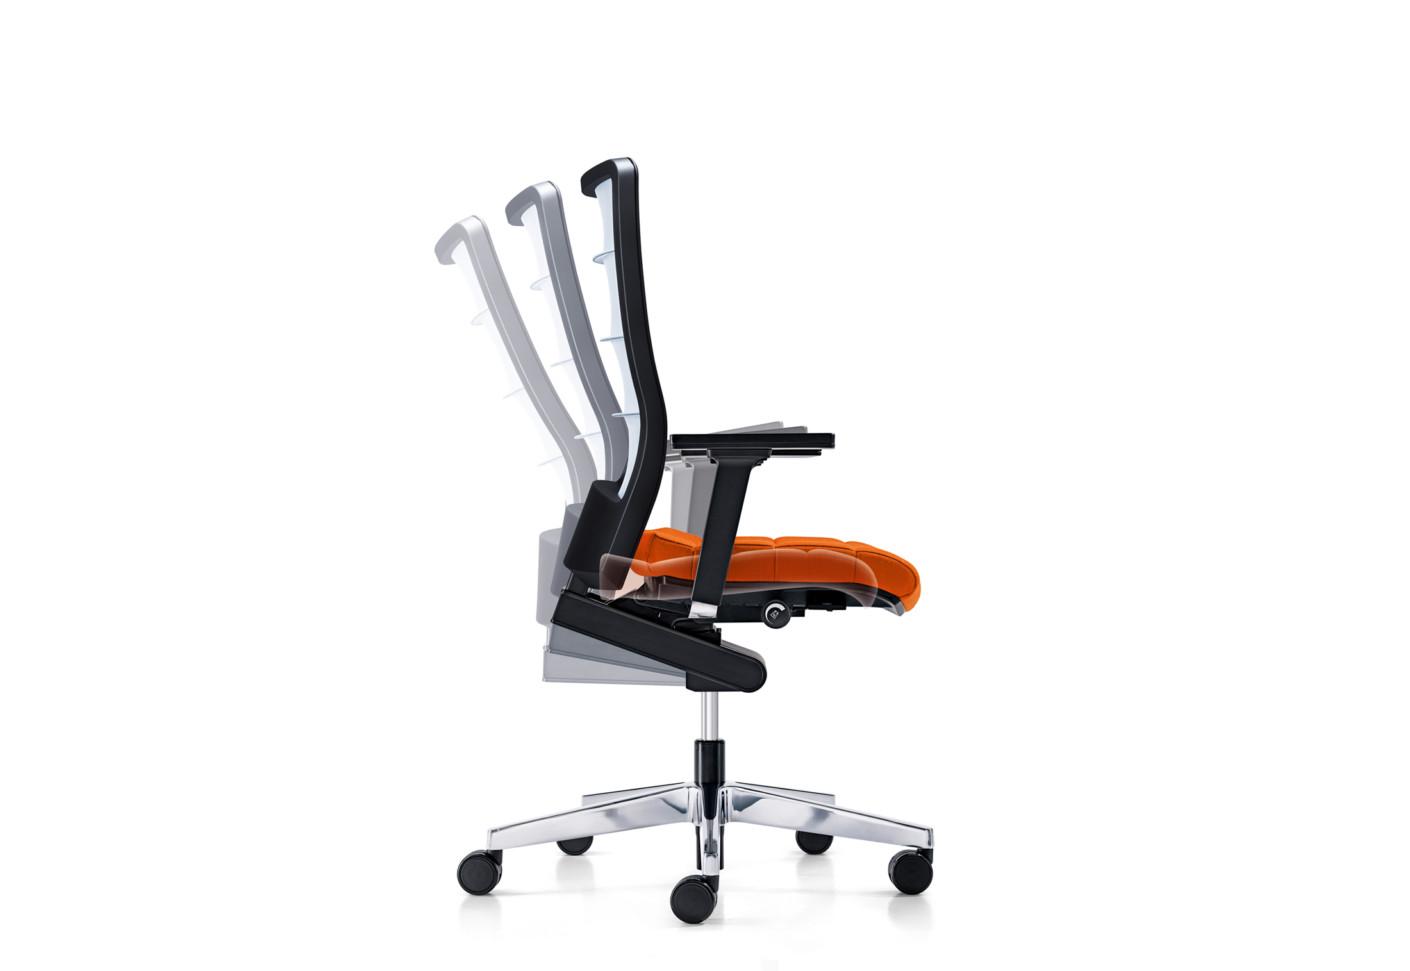 Airpad swivel chair by interstuhl stylepark - Interstuhl jobs ...